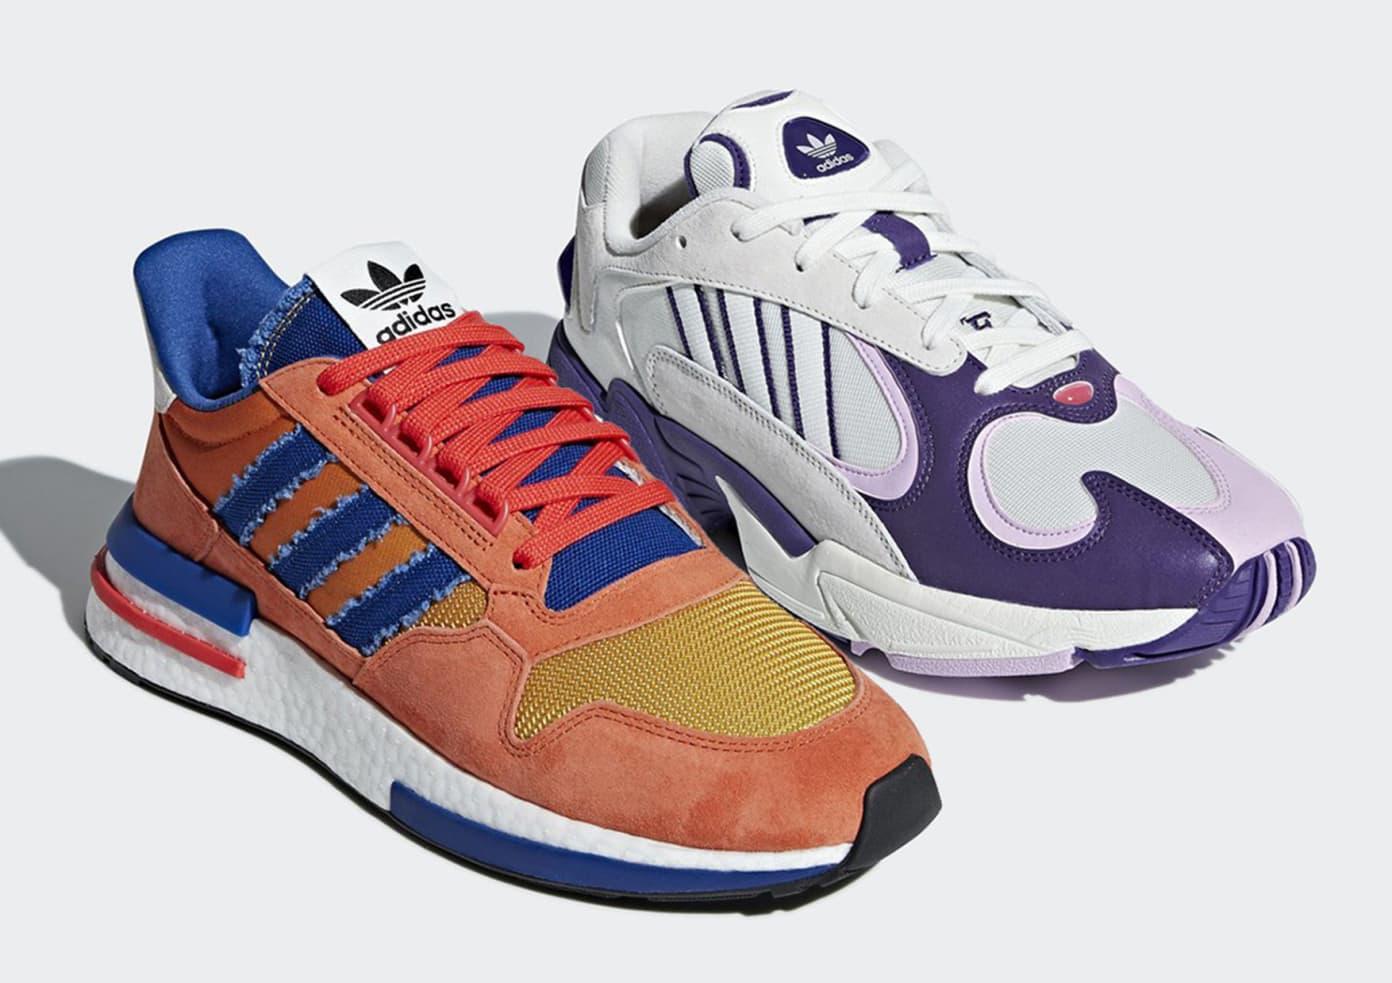 Monetario Mascotas saltar  adidas x Dragon Ball Z Yung-1 and ZX 500 RM   Shelflife